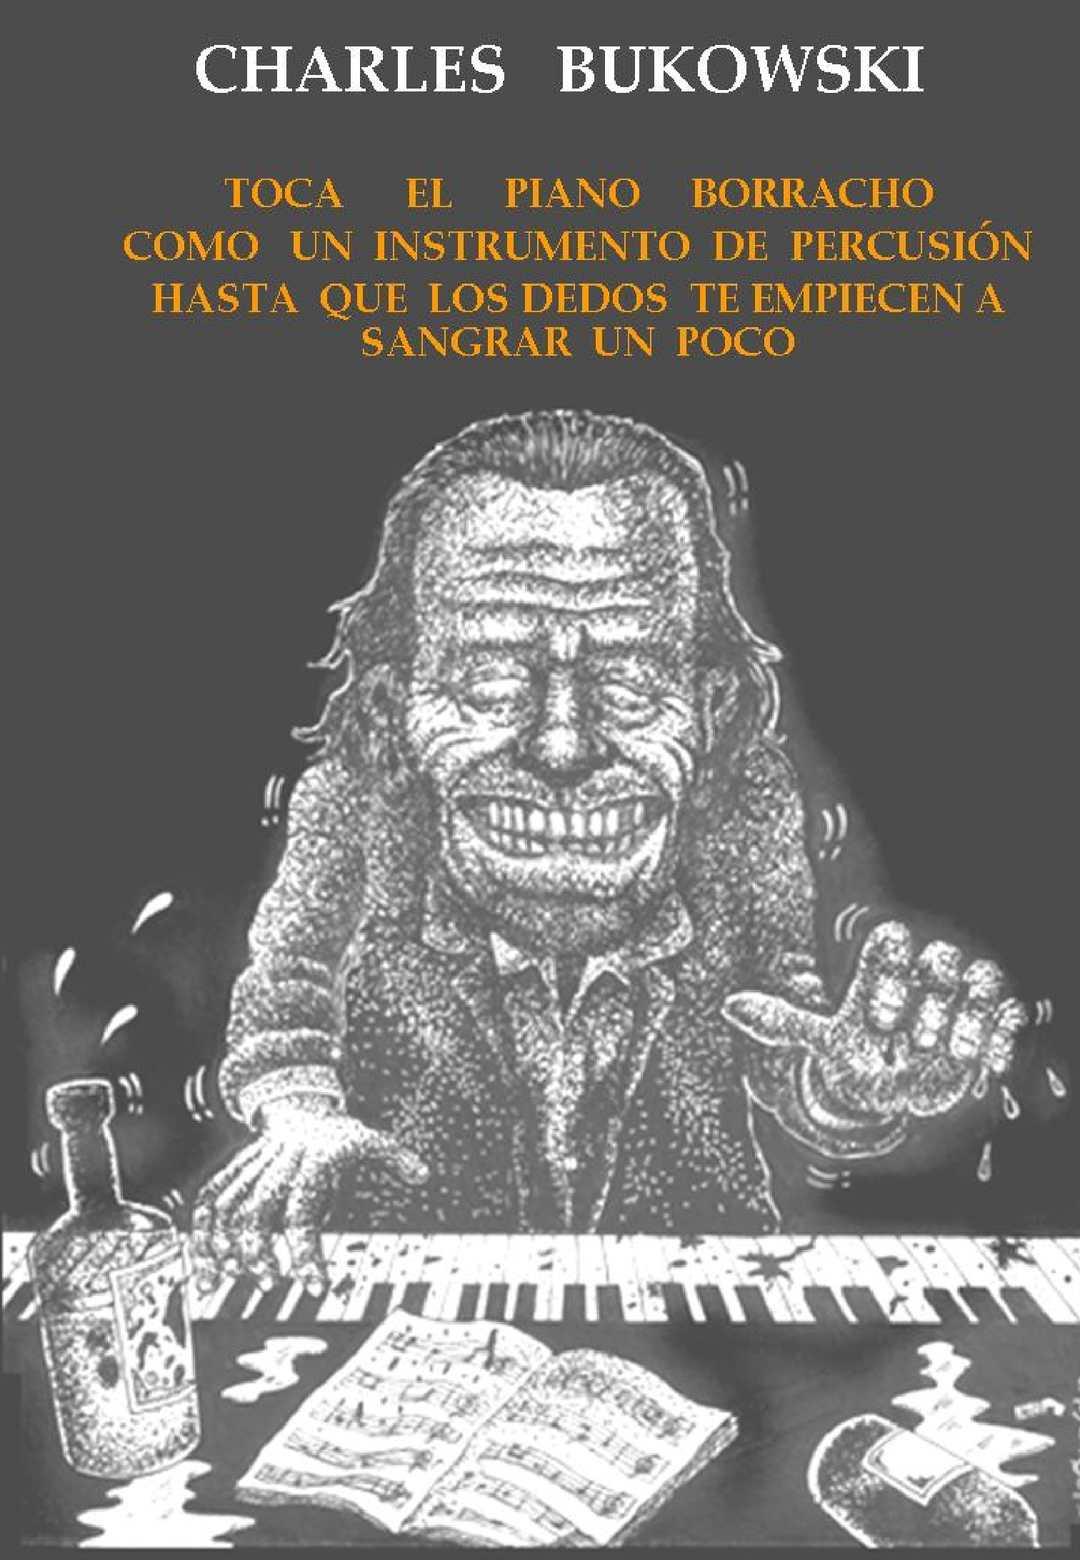 Calaméo Toca El Piano Borracho Charles Bukowski